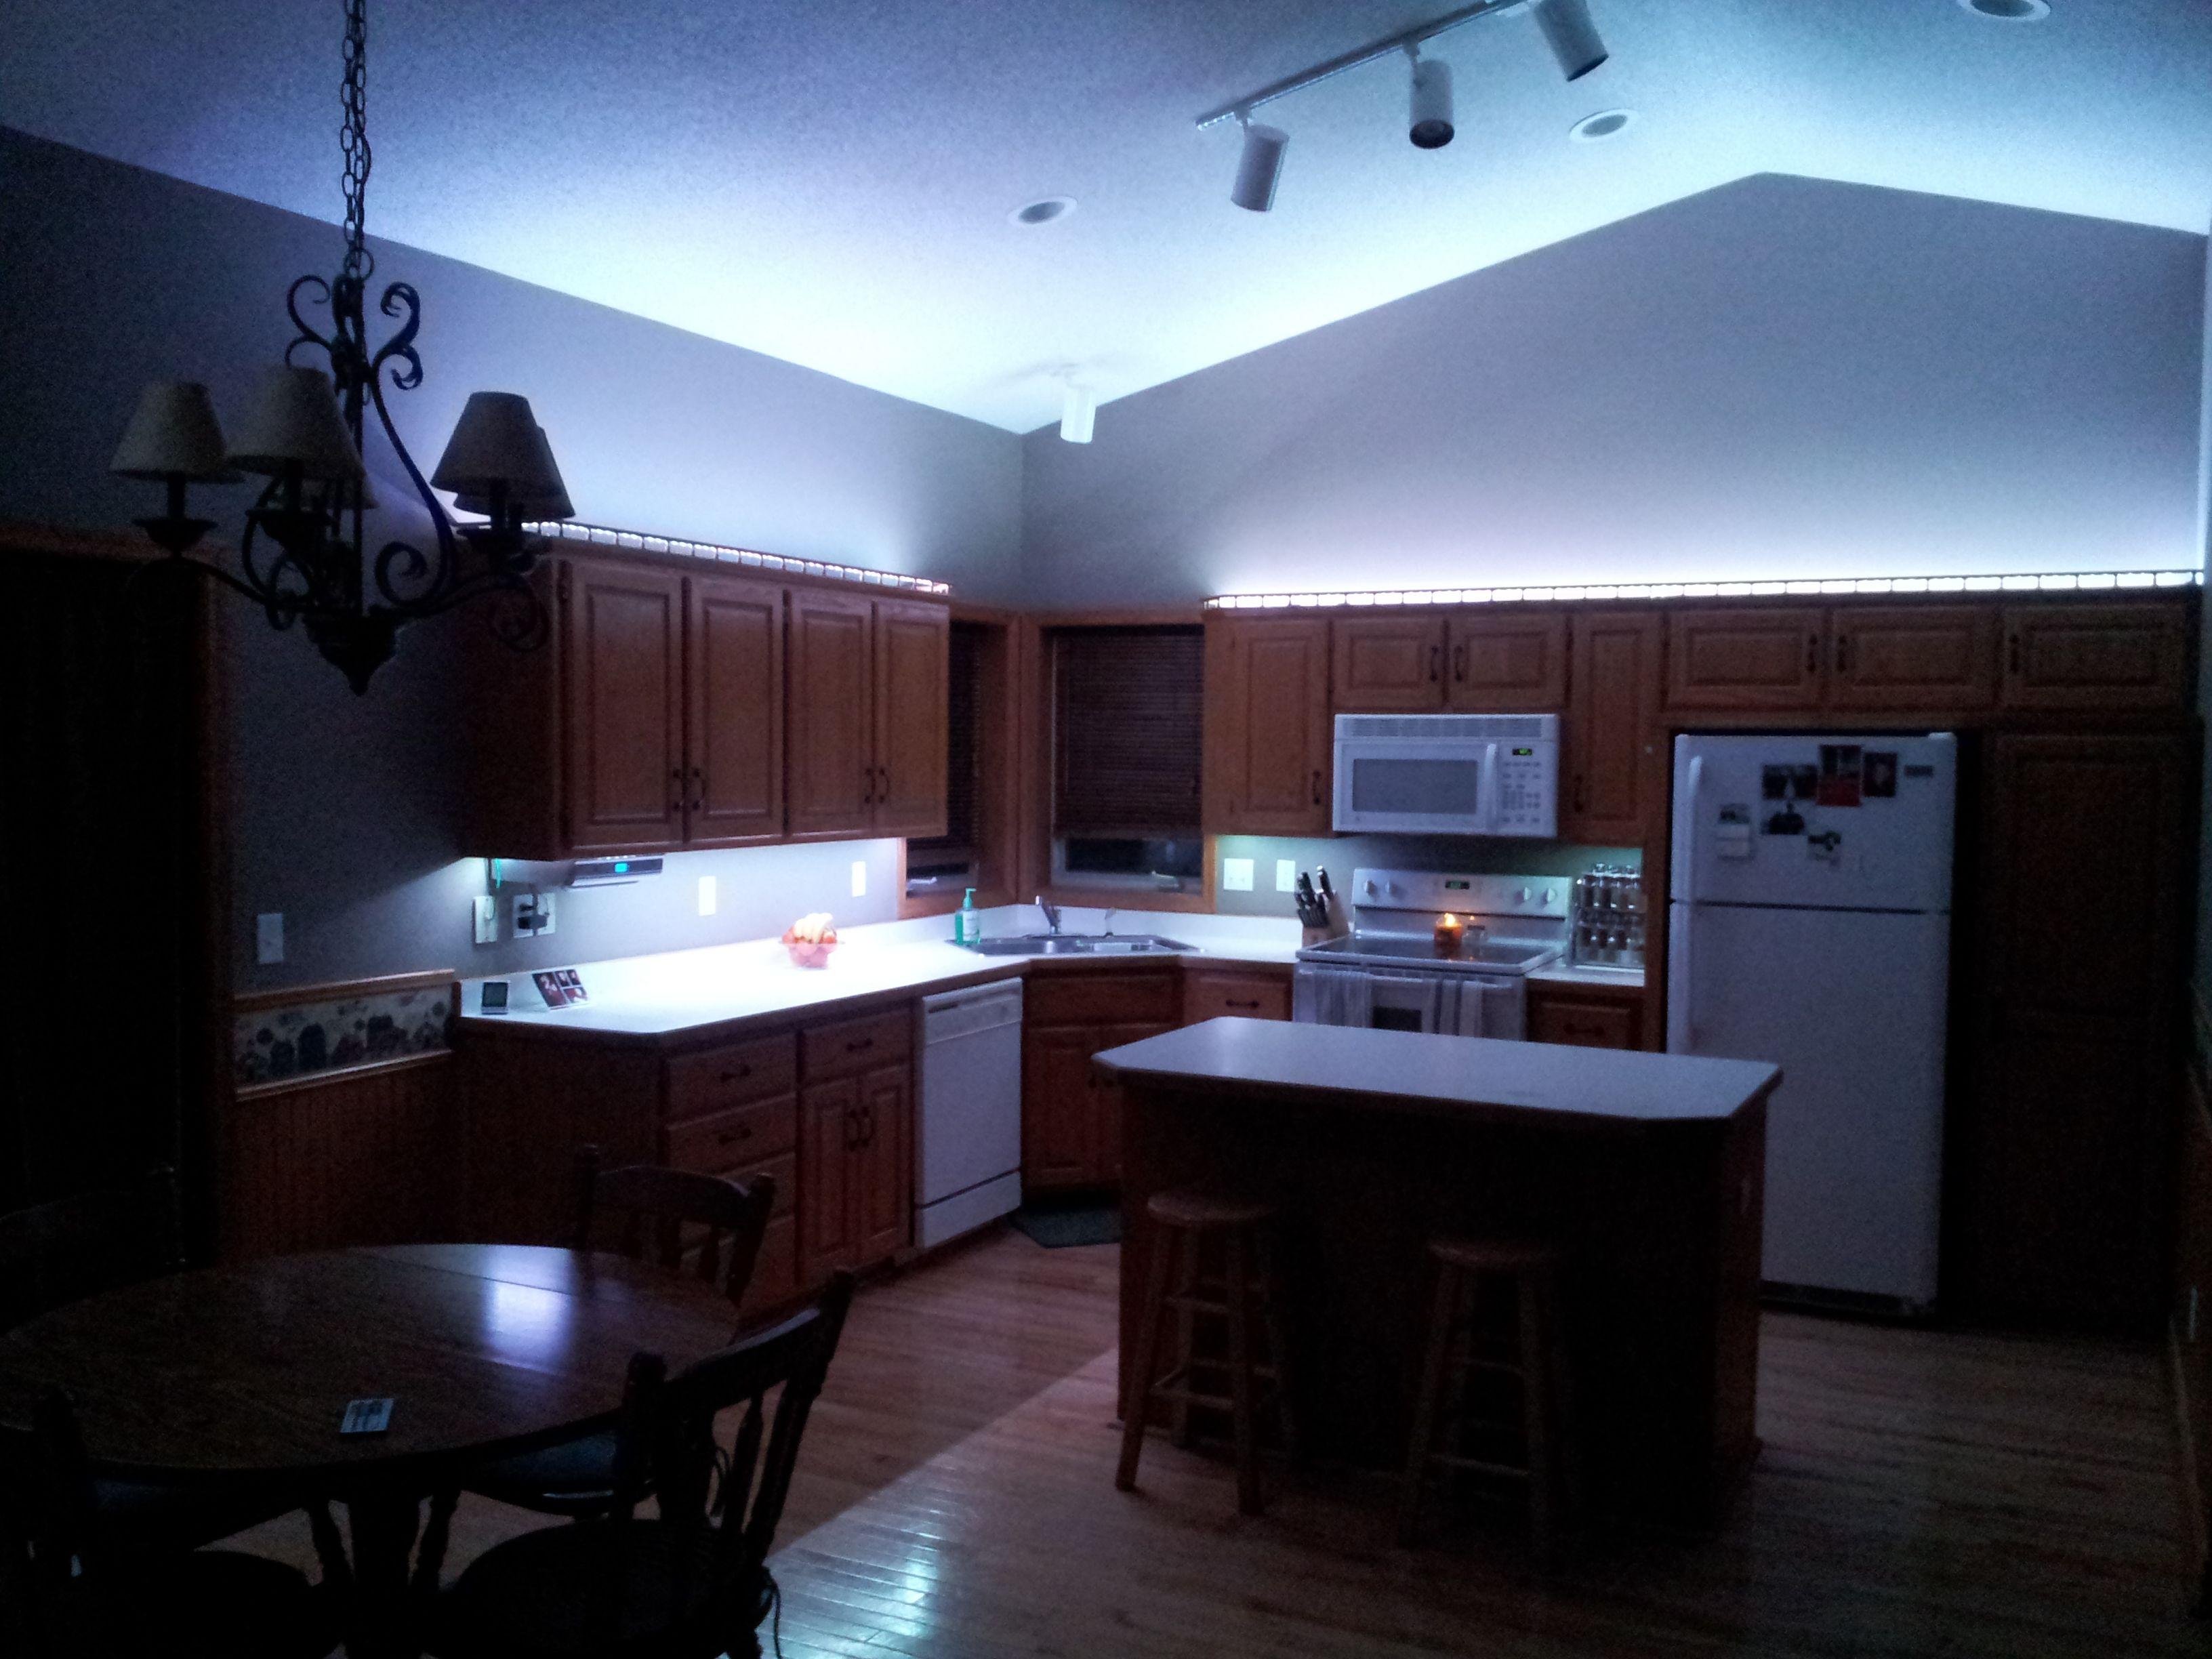 Kitchen Light Design Beauteous Led Light Design Top Kitchen Lighting Ideas Fixture Country Design Ideas